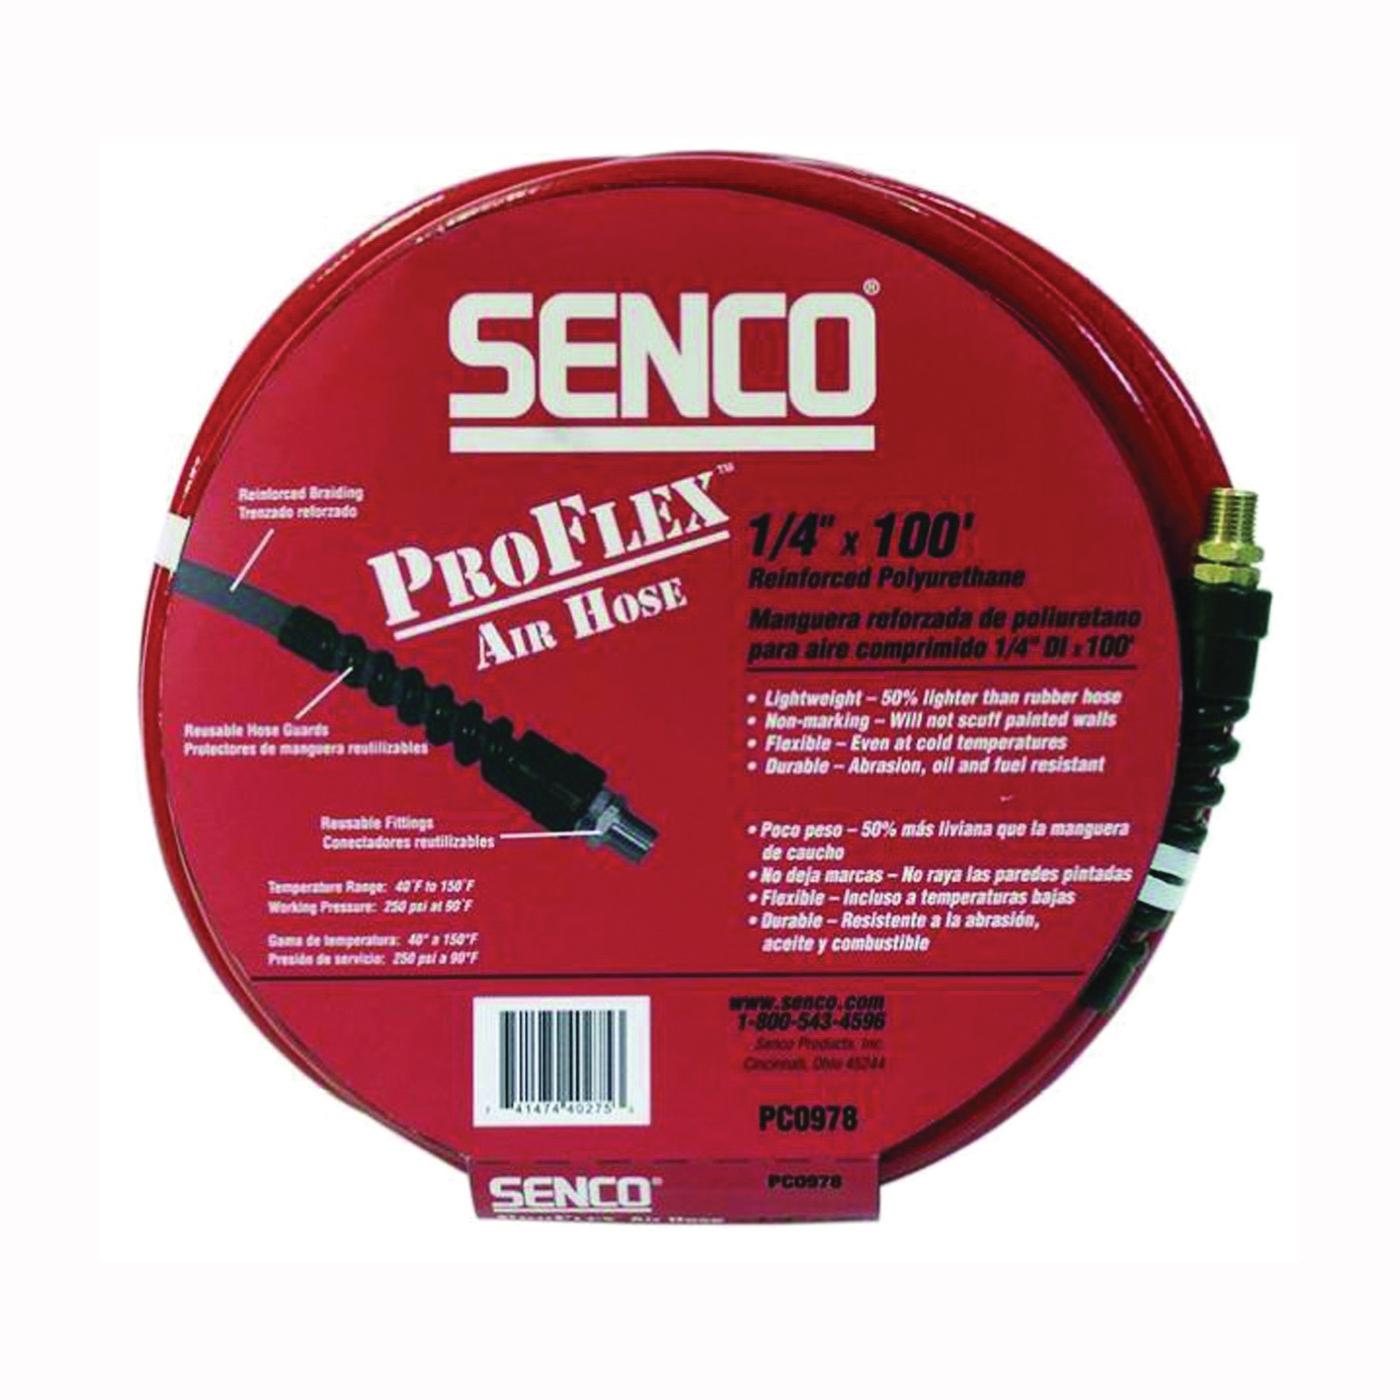 Picture of SENCO PC0978 Air Hose, 1/4 in OD, 100 ft L, MPT, 250 psi Pressure, Polyurethane